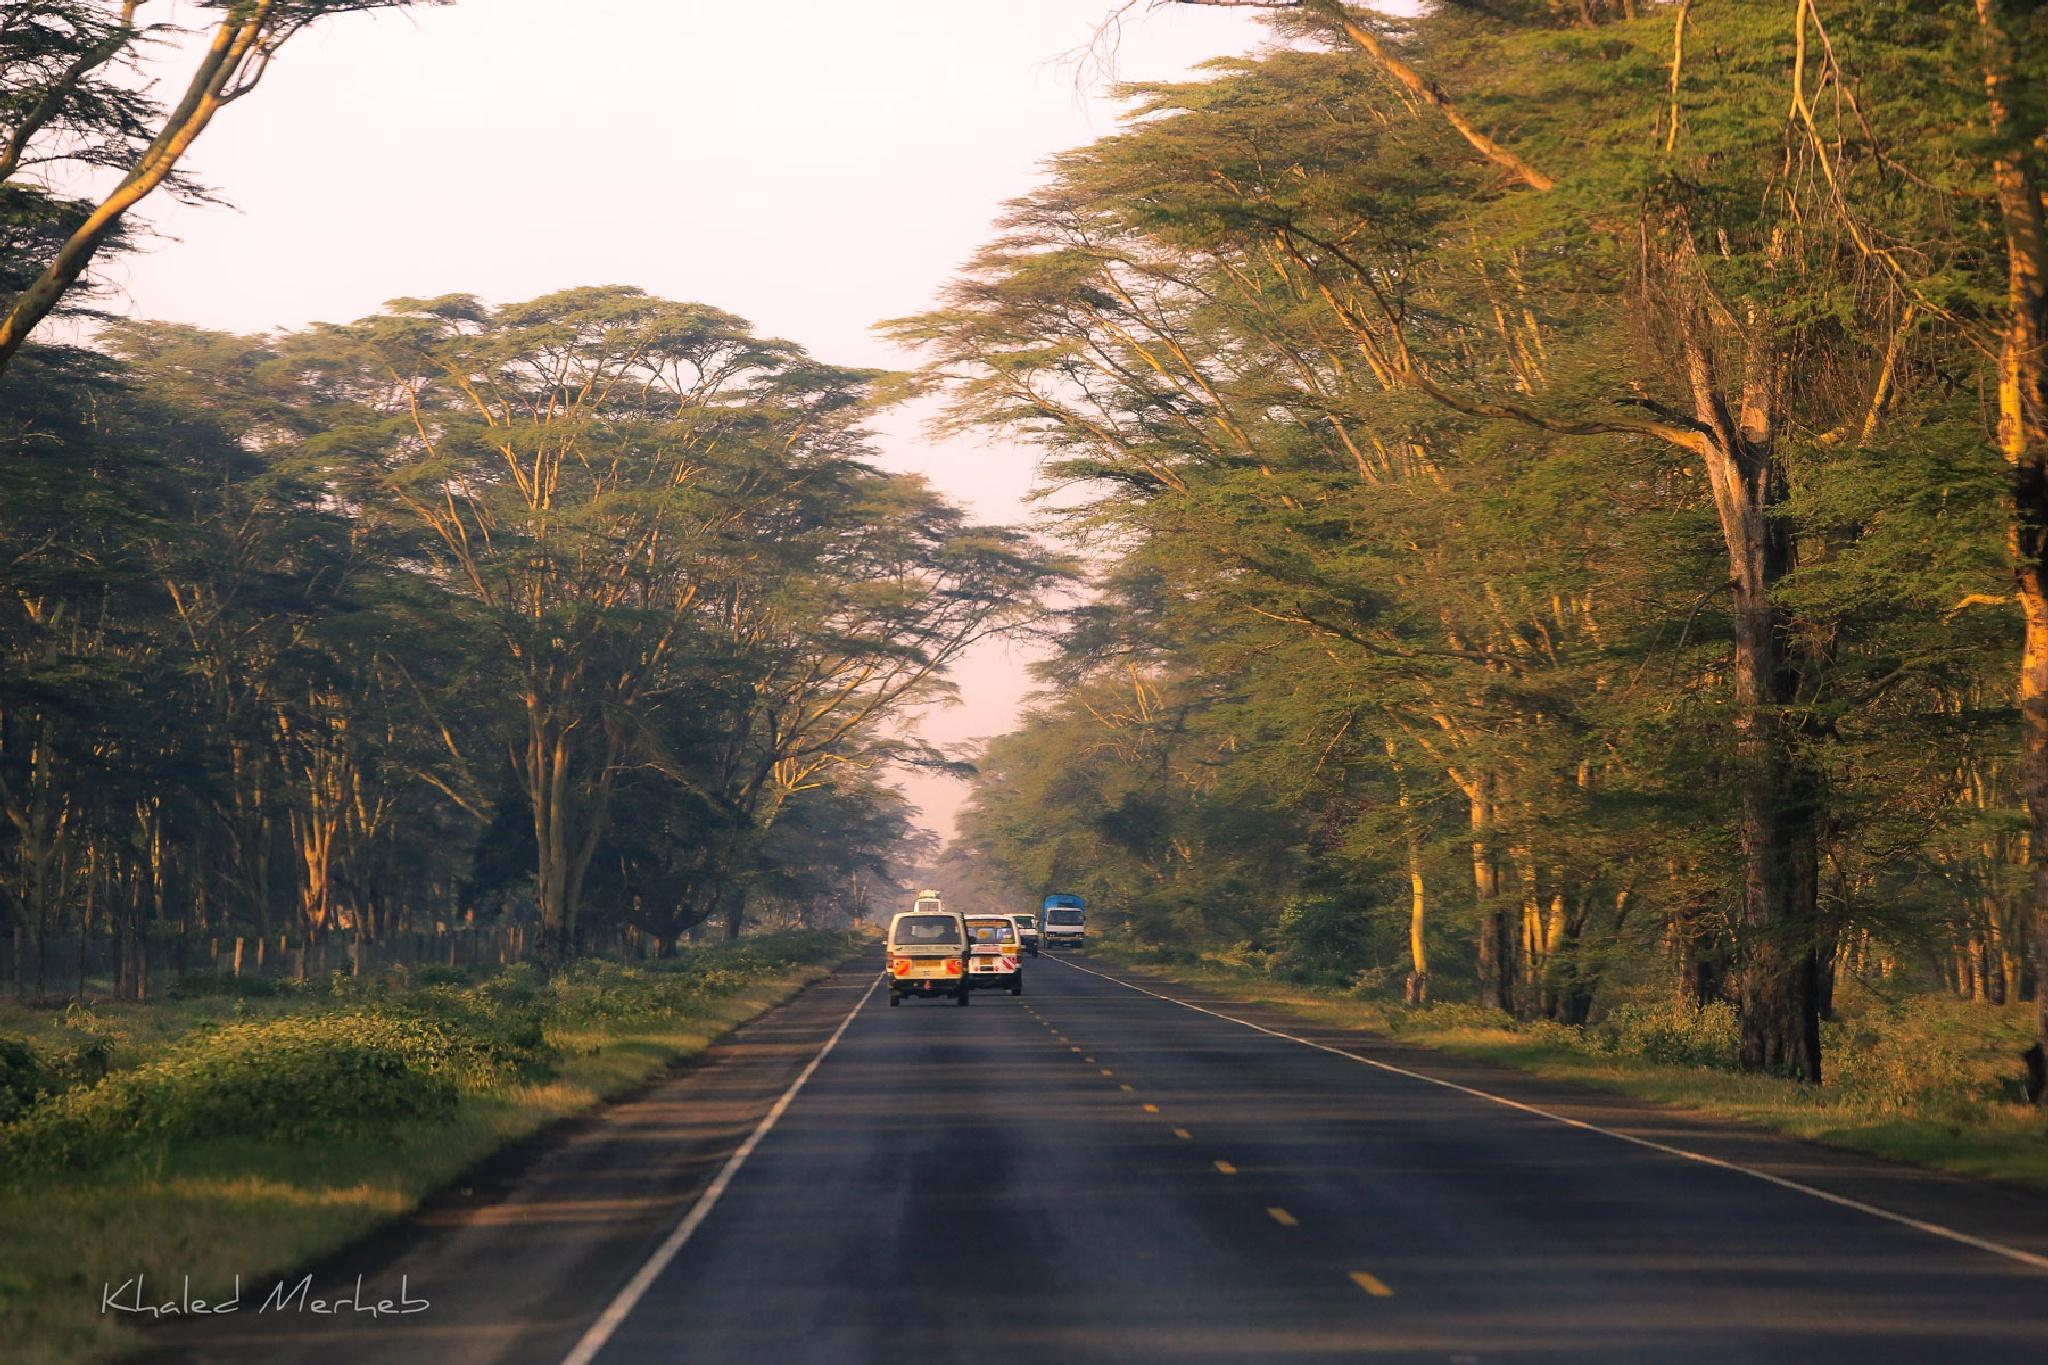 Nakuru, Kenya by khaledMerheb